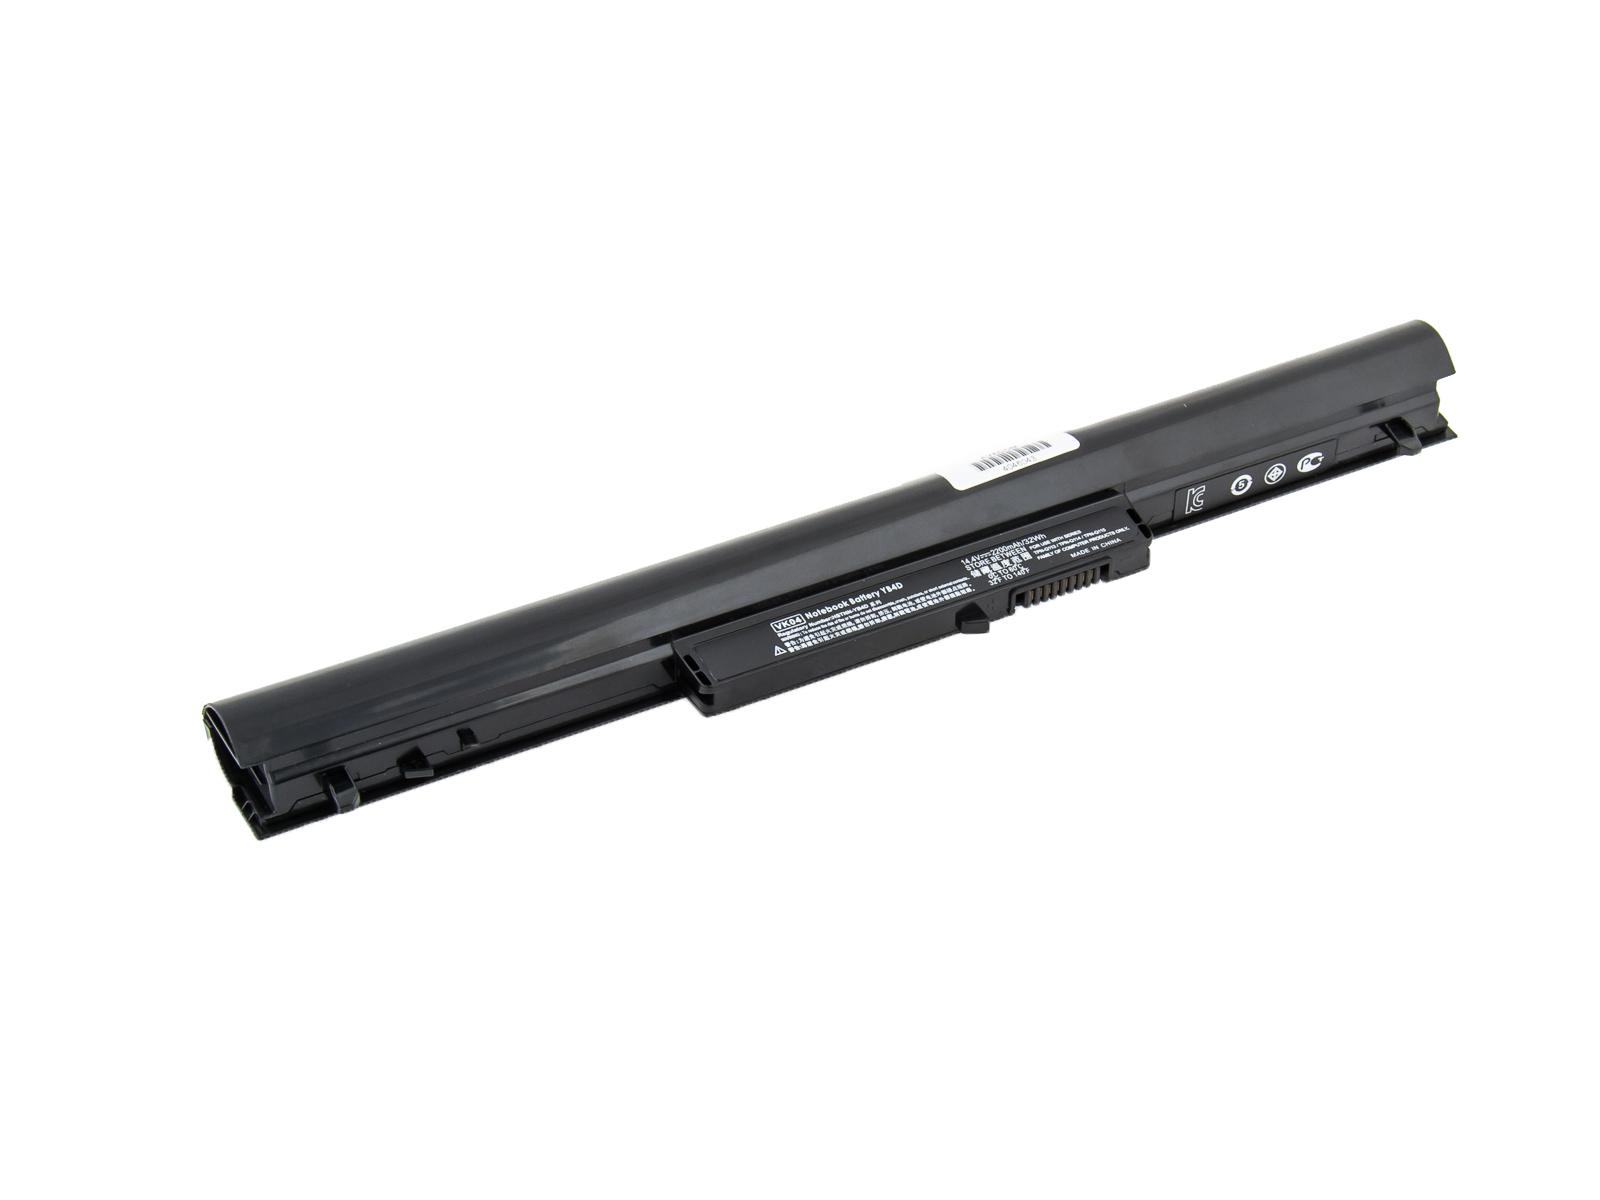 AVACOM baterie pro HP Pavilion Sleekbook 14-b0xx, Sleekbook 15-b0xx, Li-Ion 14,4V 2200mAh